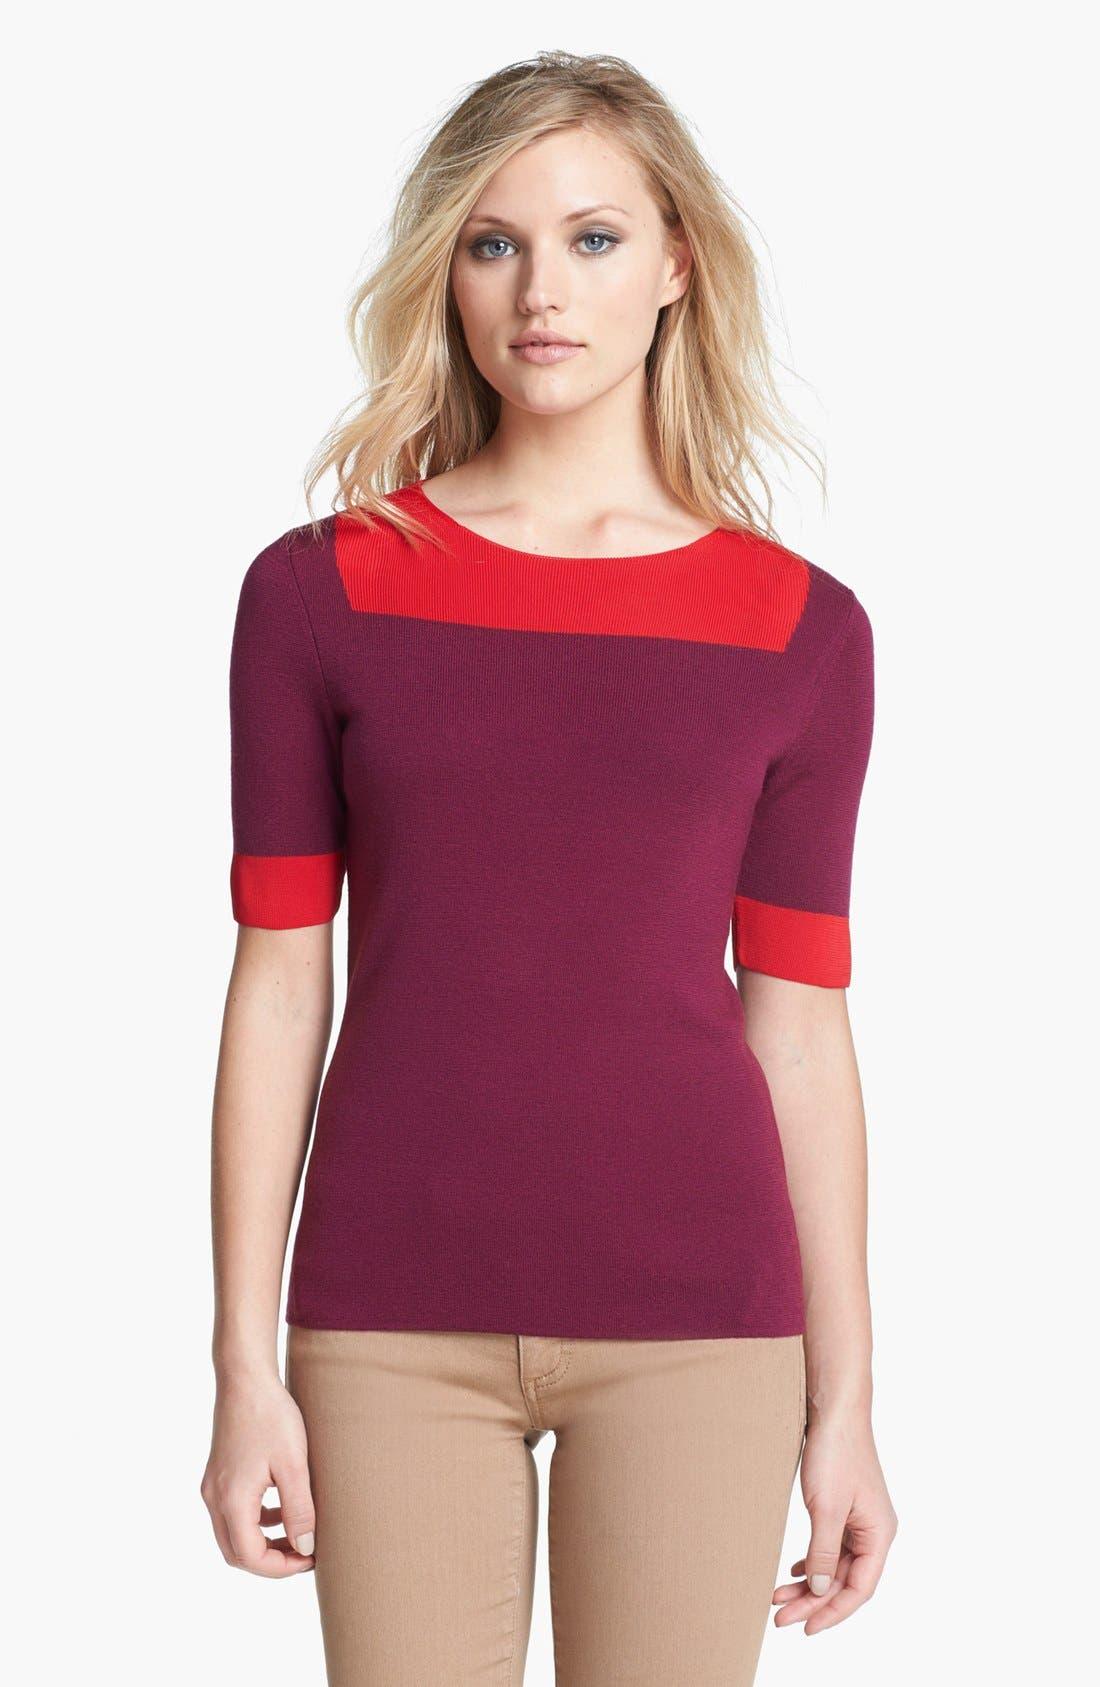 Alternate Image 1 Selected - Tory Burch 'Juliet' Sweater